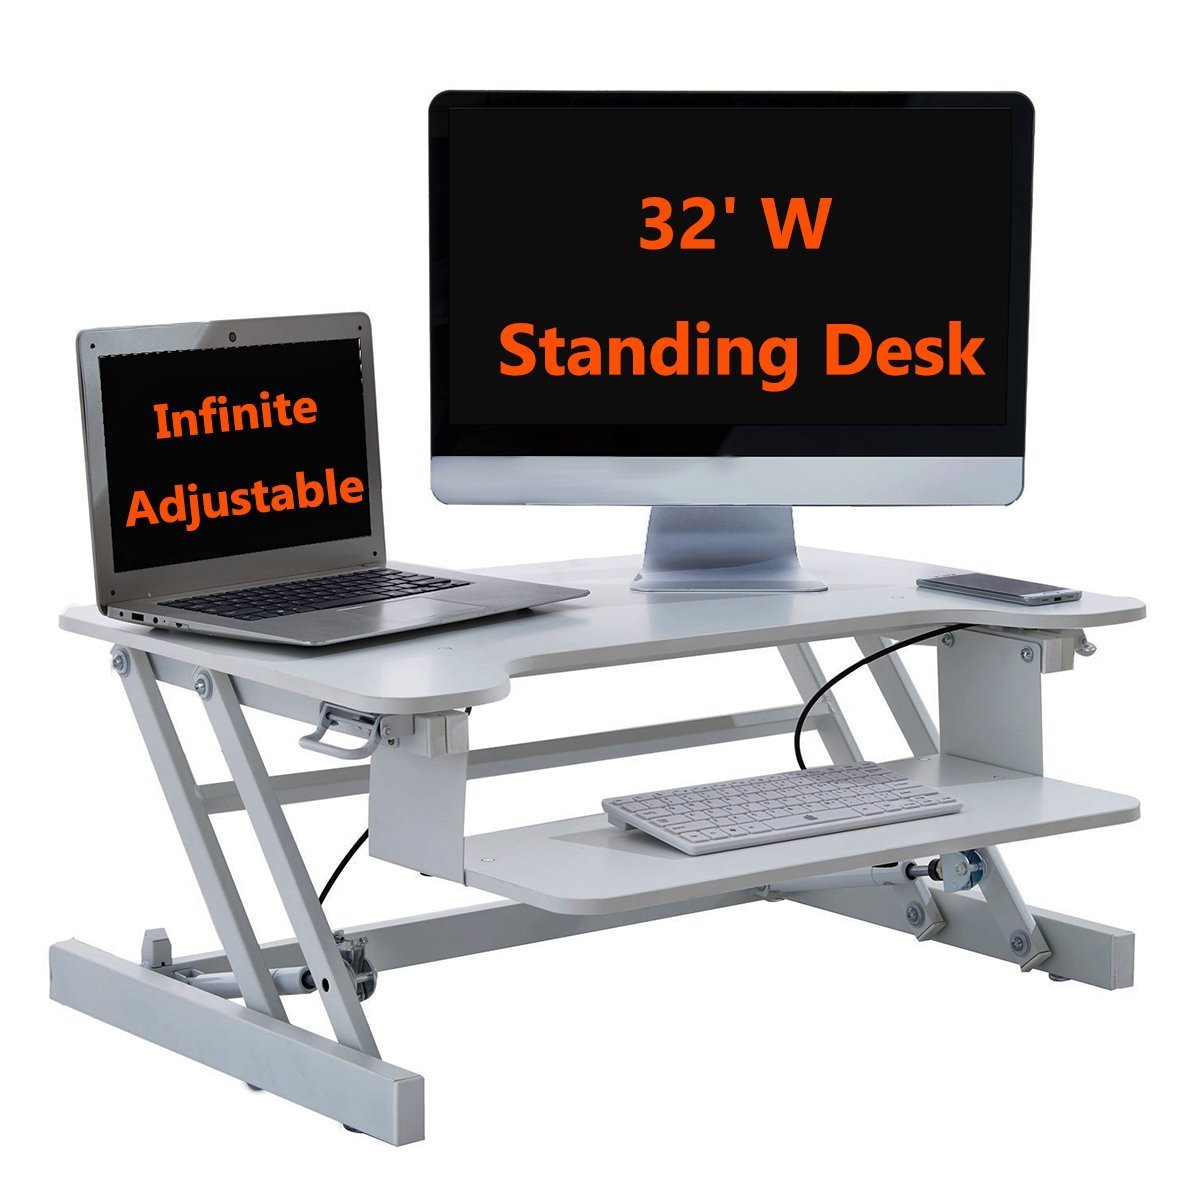 Height Adjustable Ergonomic Sit Stand 2-Tier Standing Desk Converter, Black/White (White)